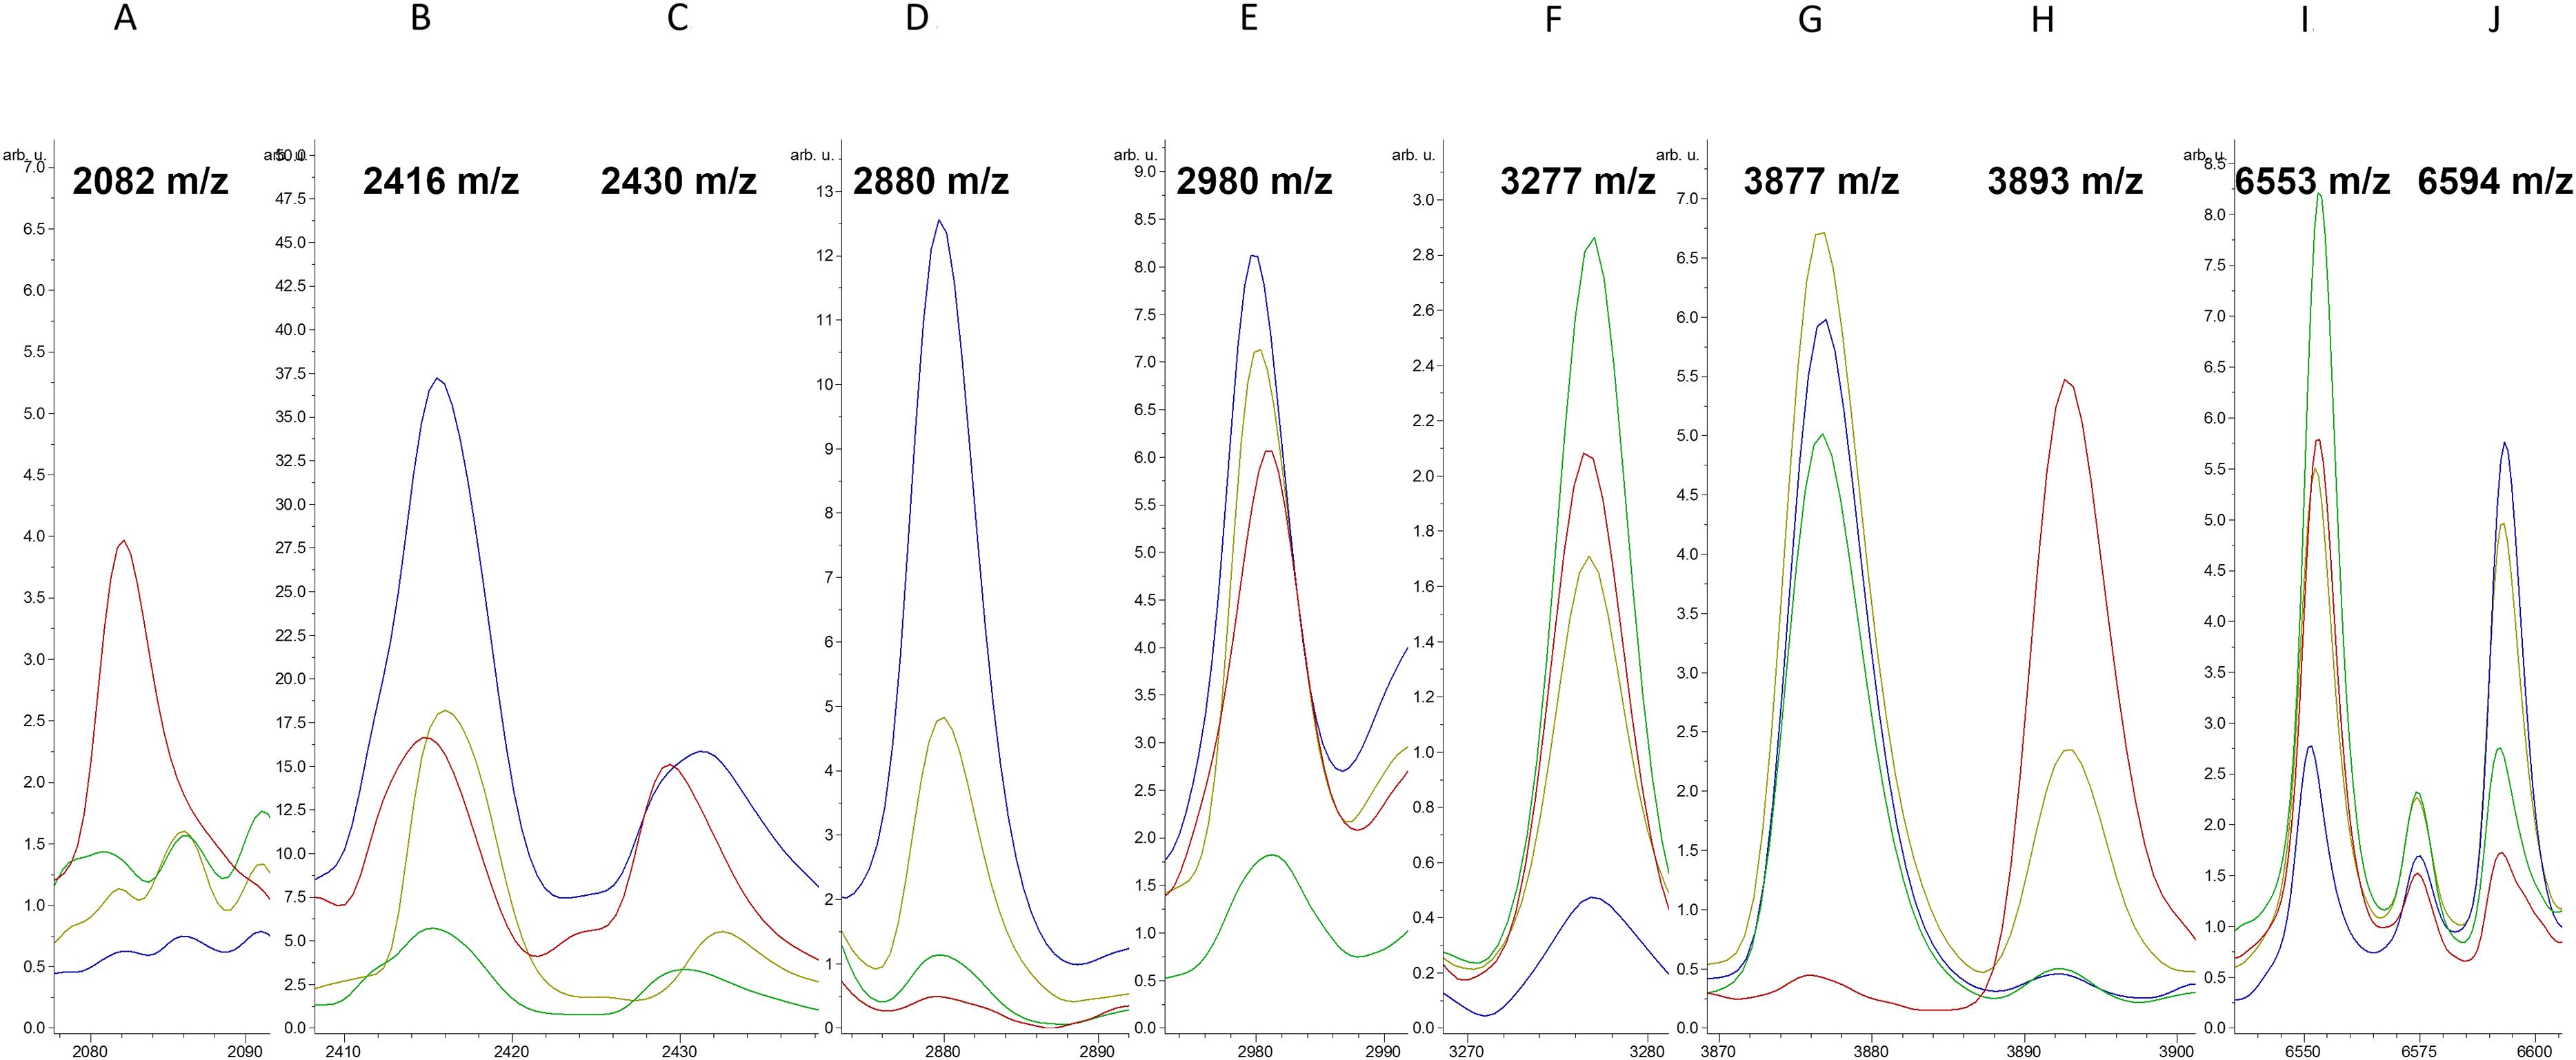 Application of a MALDI-TOF analysis platform (ClinProTools